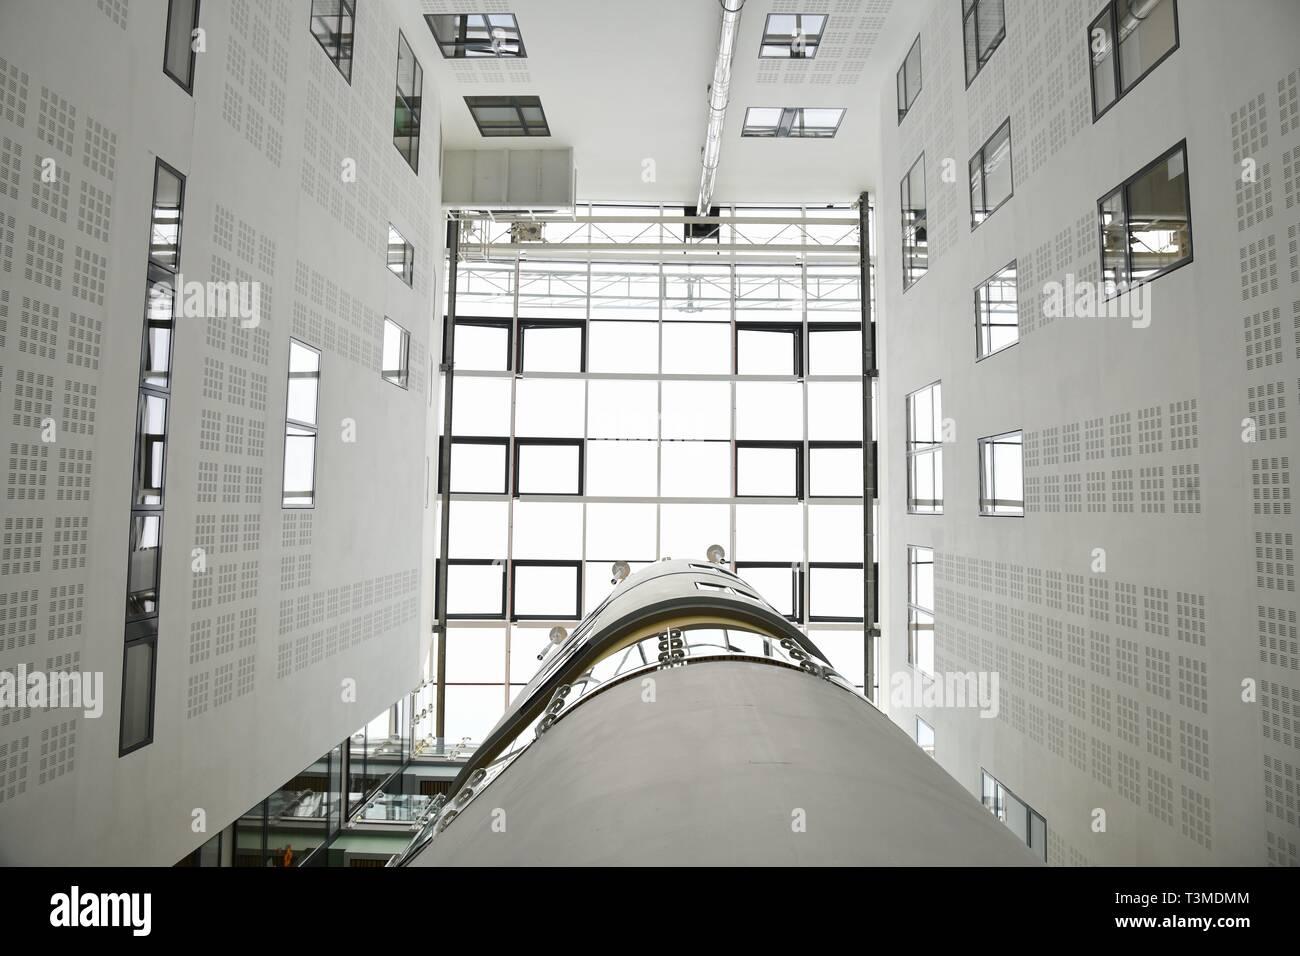 Brighton general hospital - Stock Image